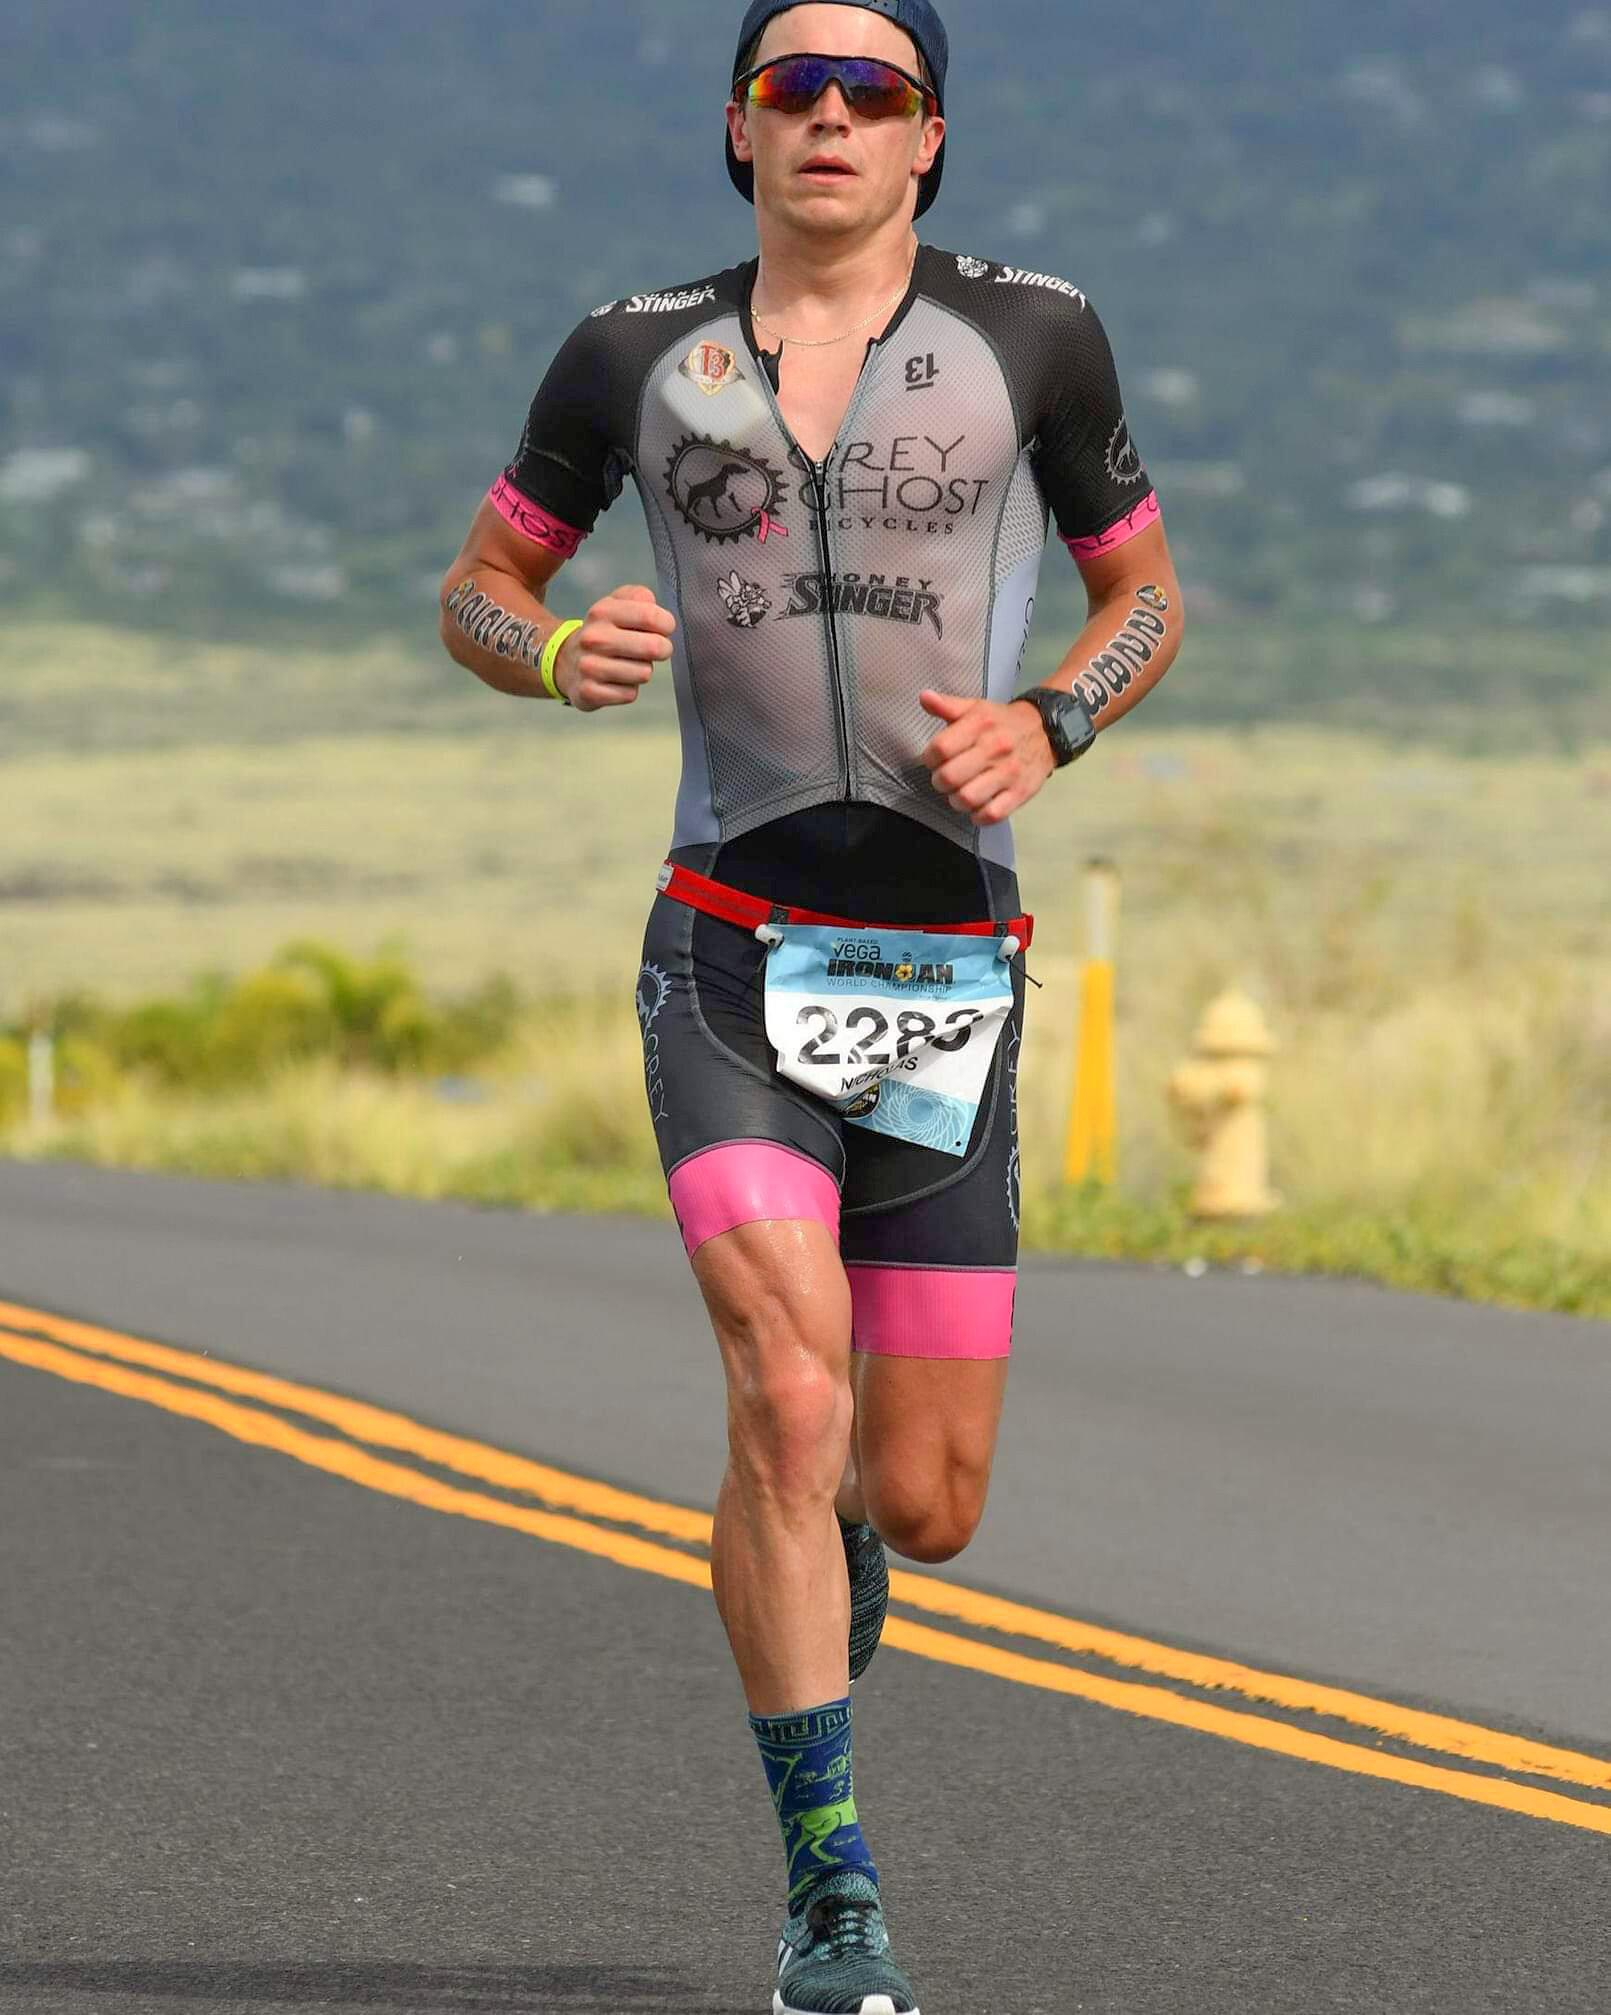 Iron man triathlete endurance event